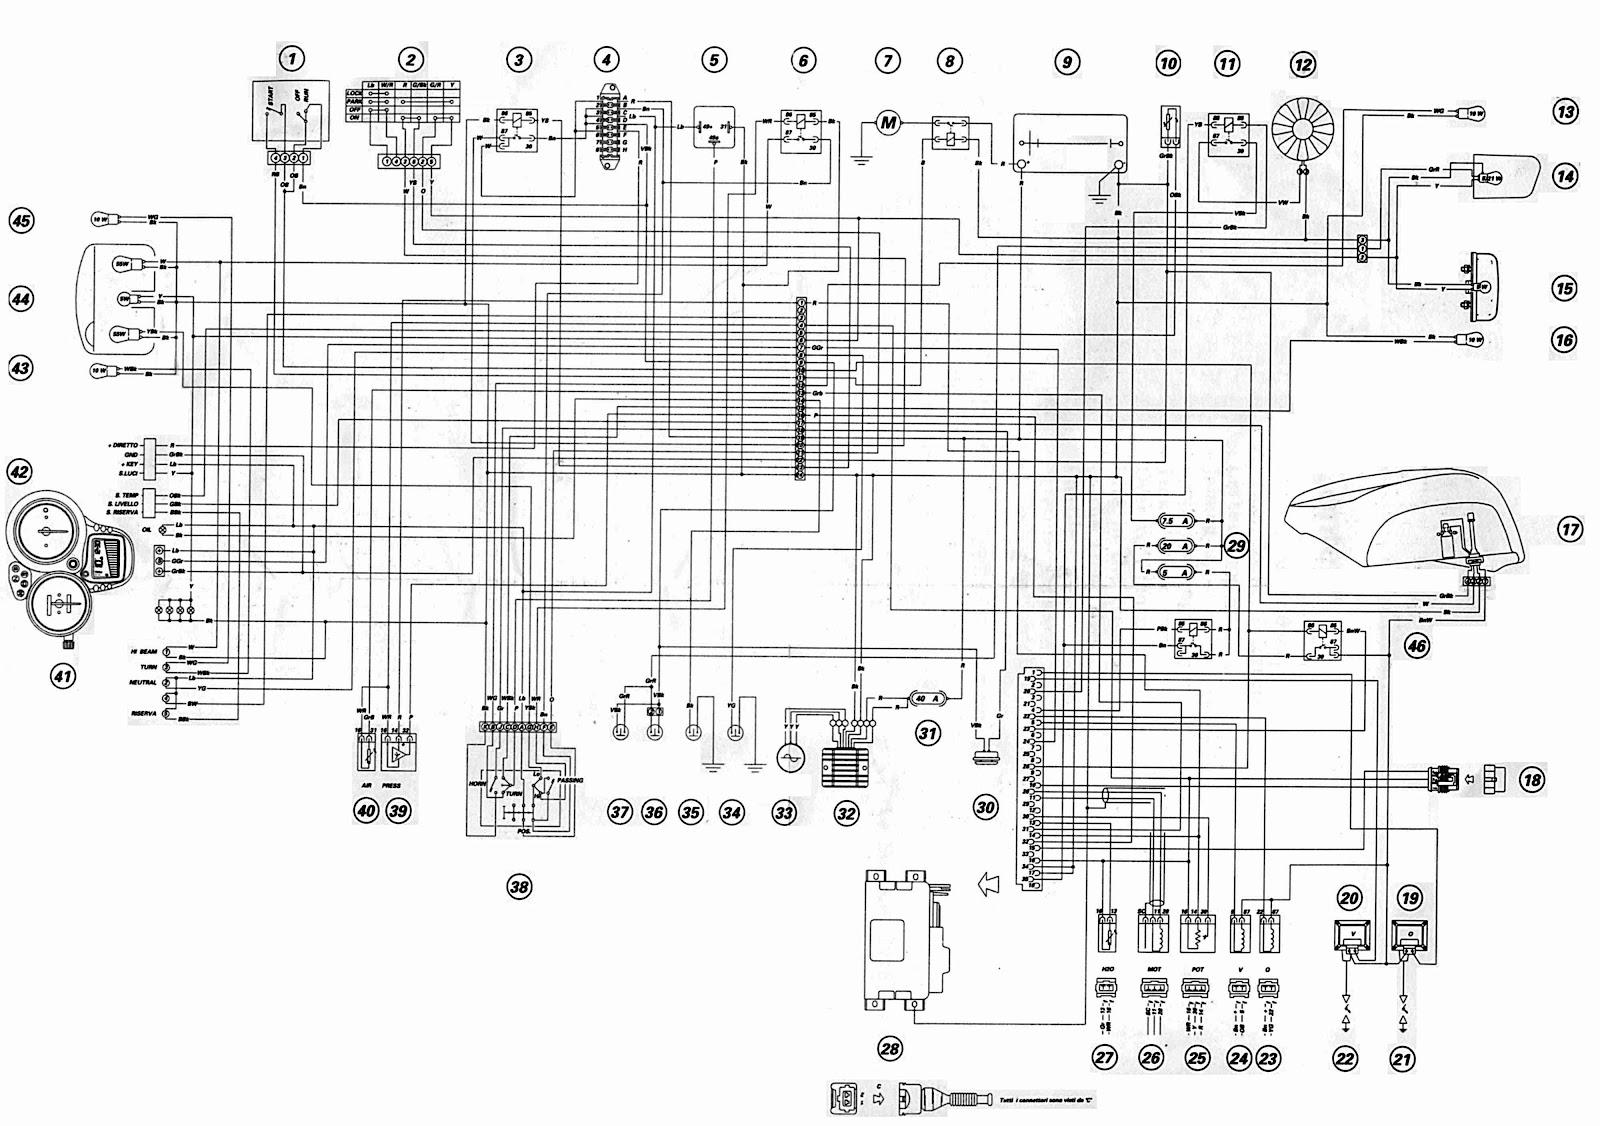 2001 Drz 400 Wiring Diagram Dr650 Suzuki Kx 125 Drz400e Electrical Diagrams On